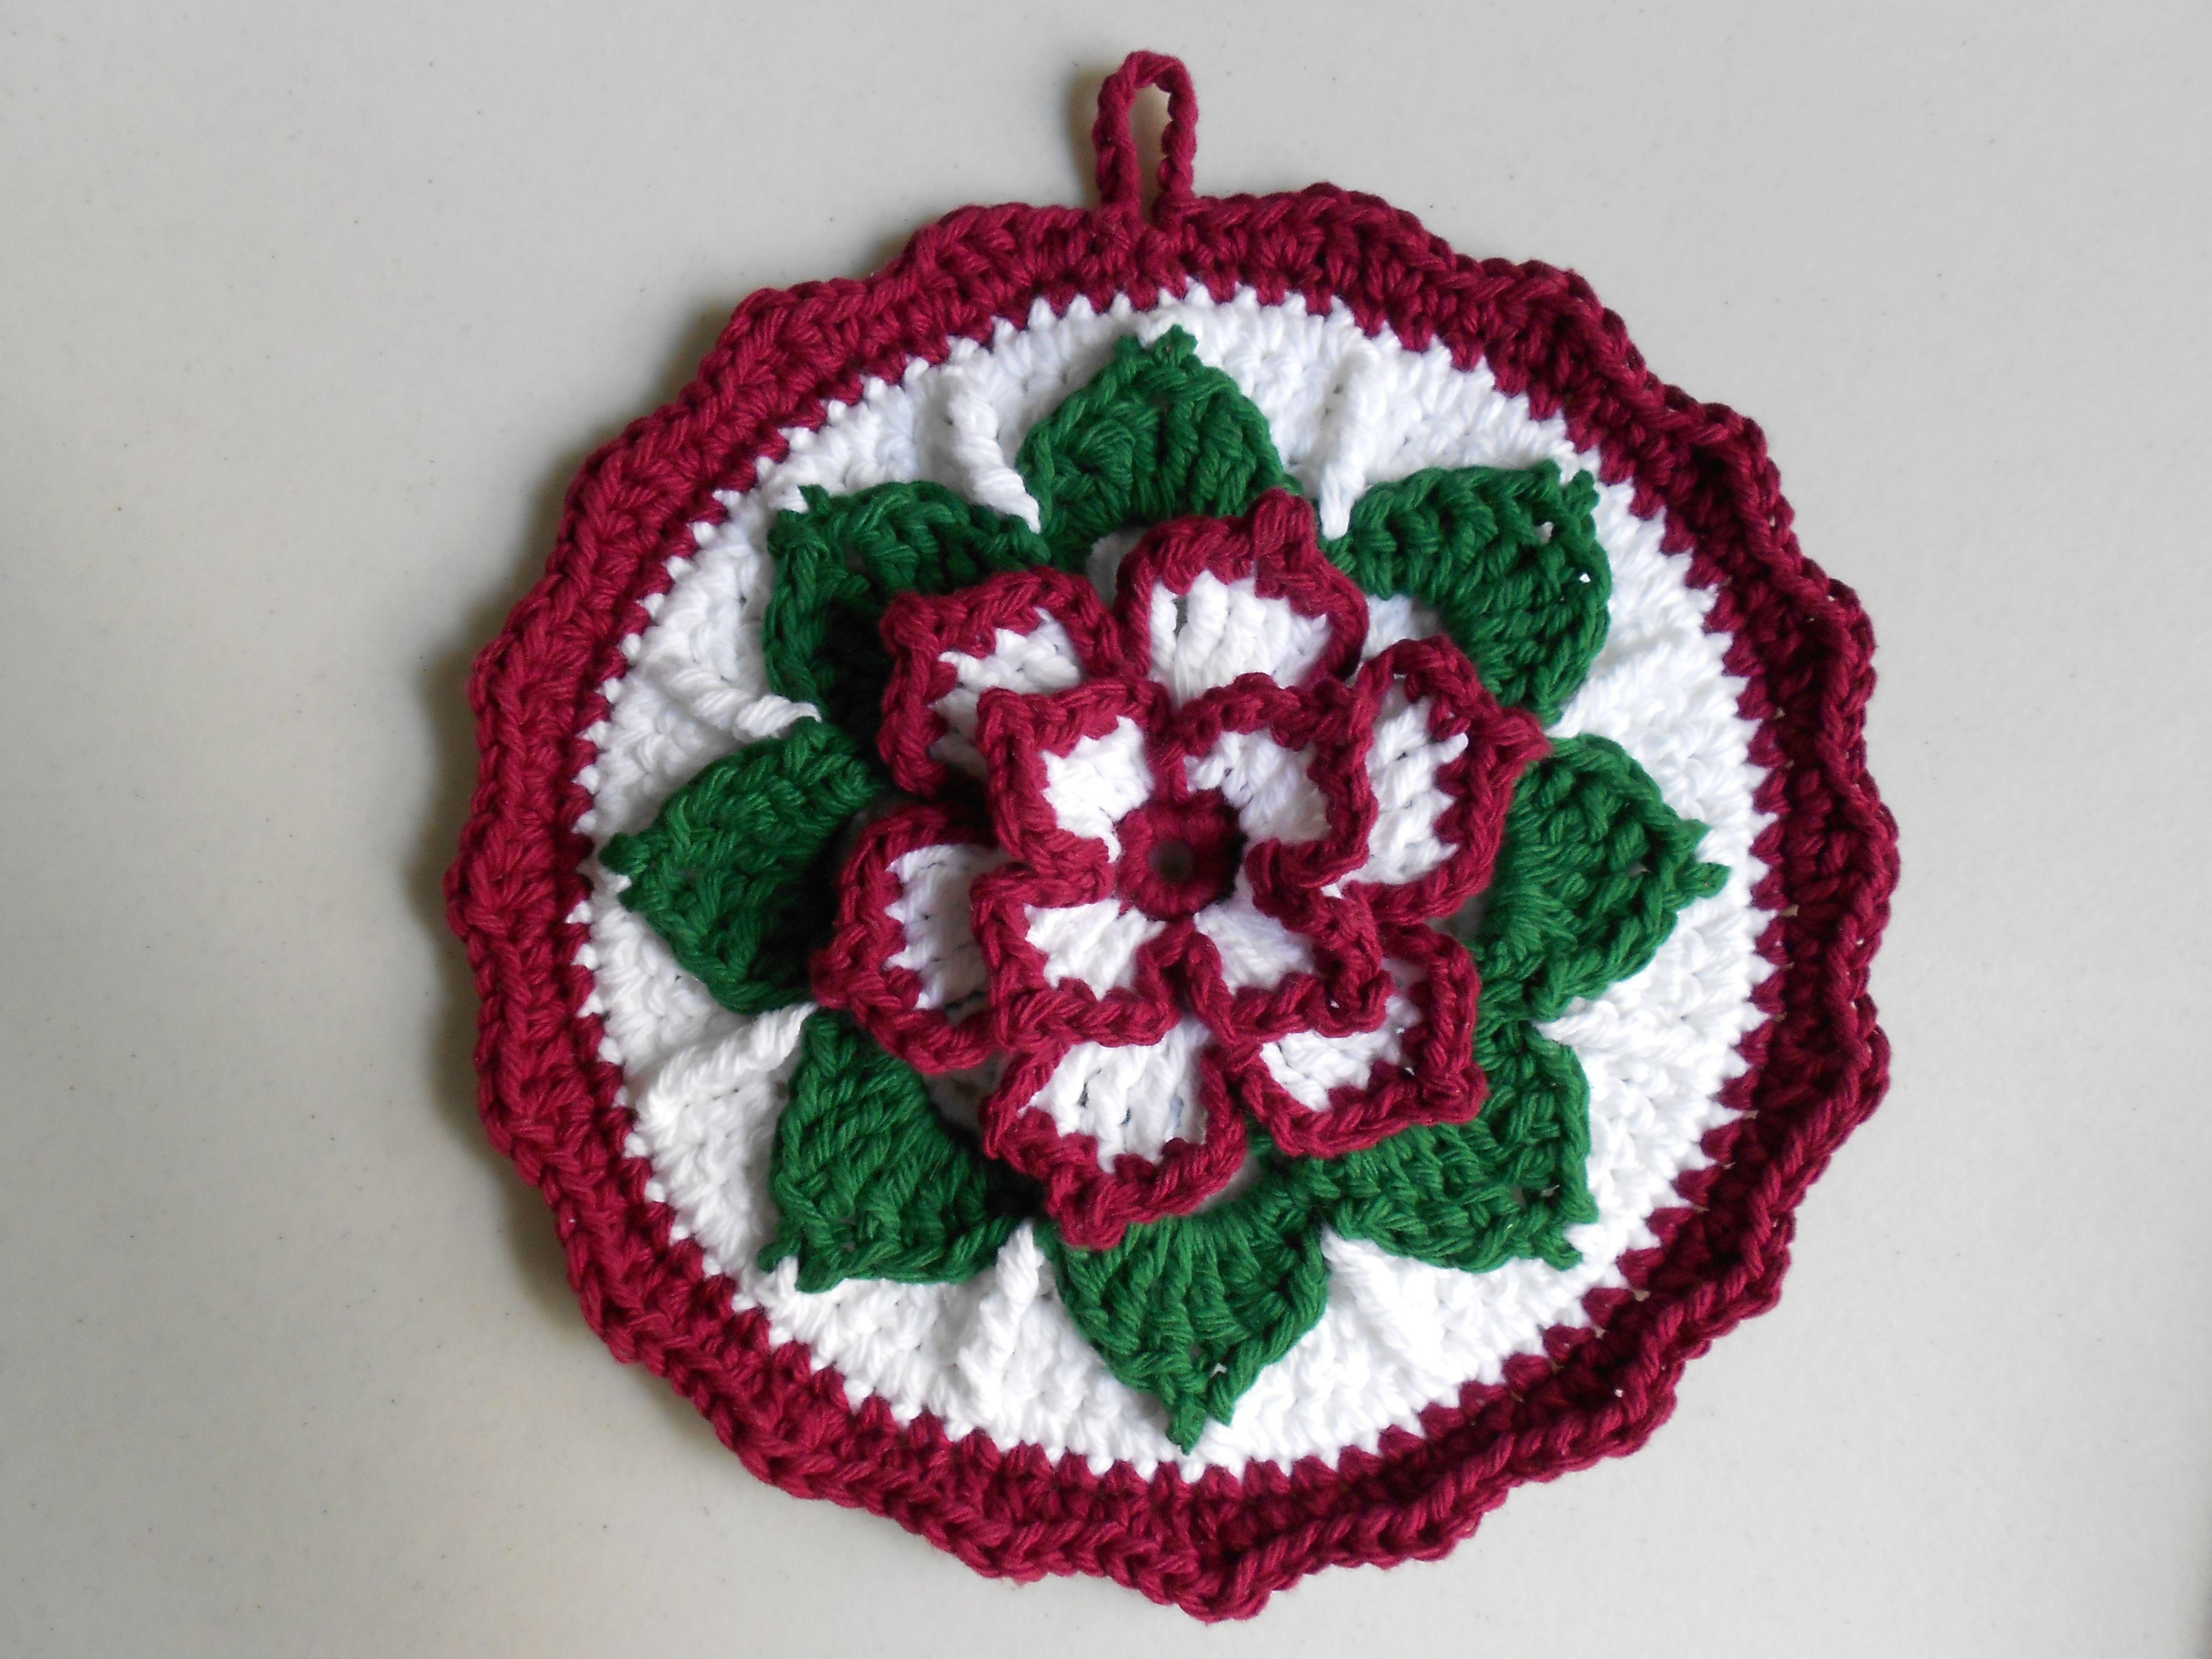 A Christmas crochet potholder